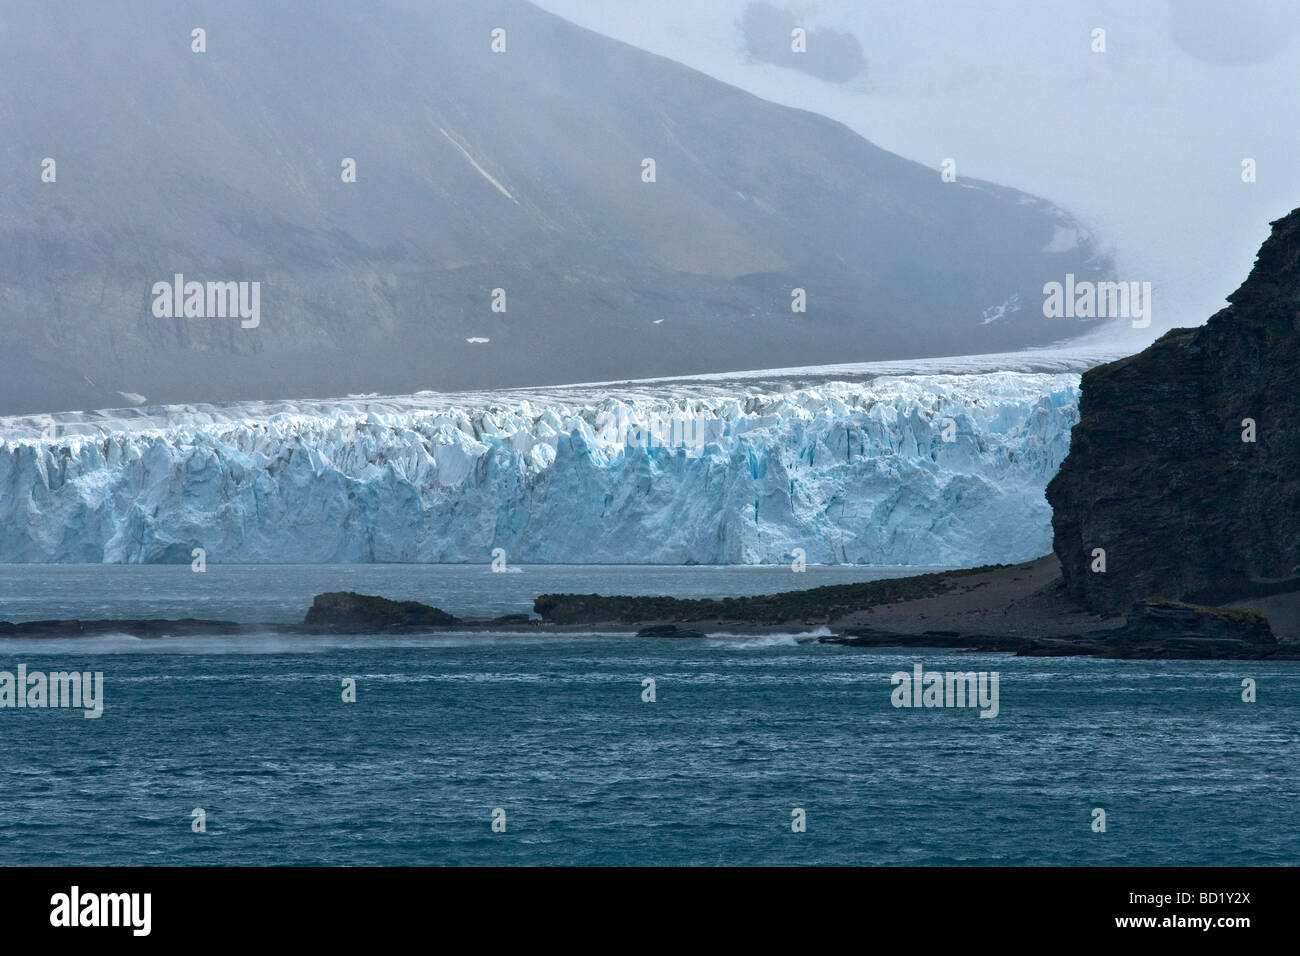 Fortuna Glacier tidewater melting into Cumberland Sound South Georgia Antarctica - Stock Image